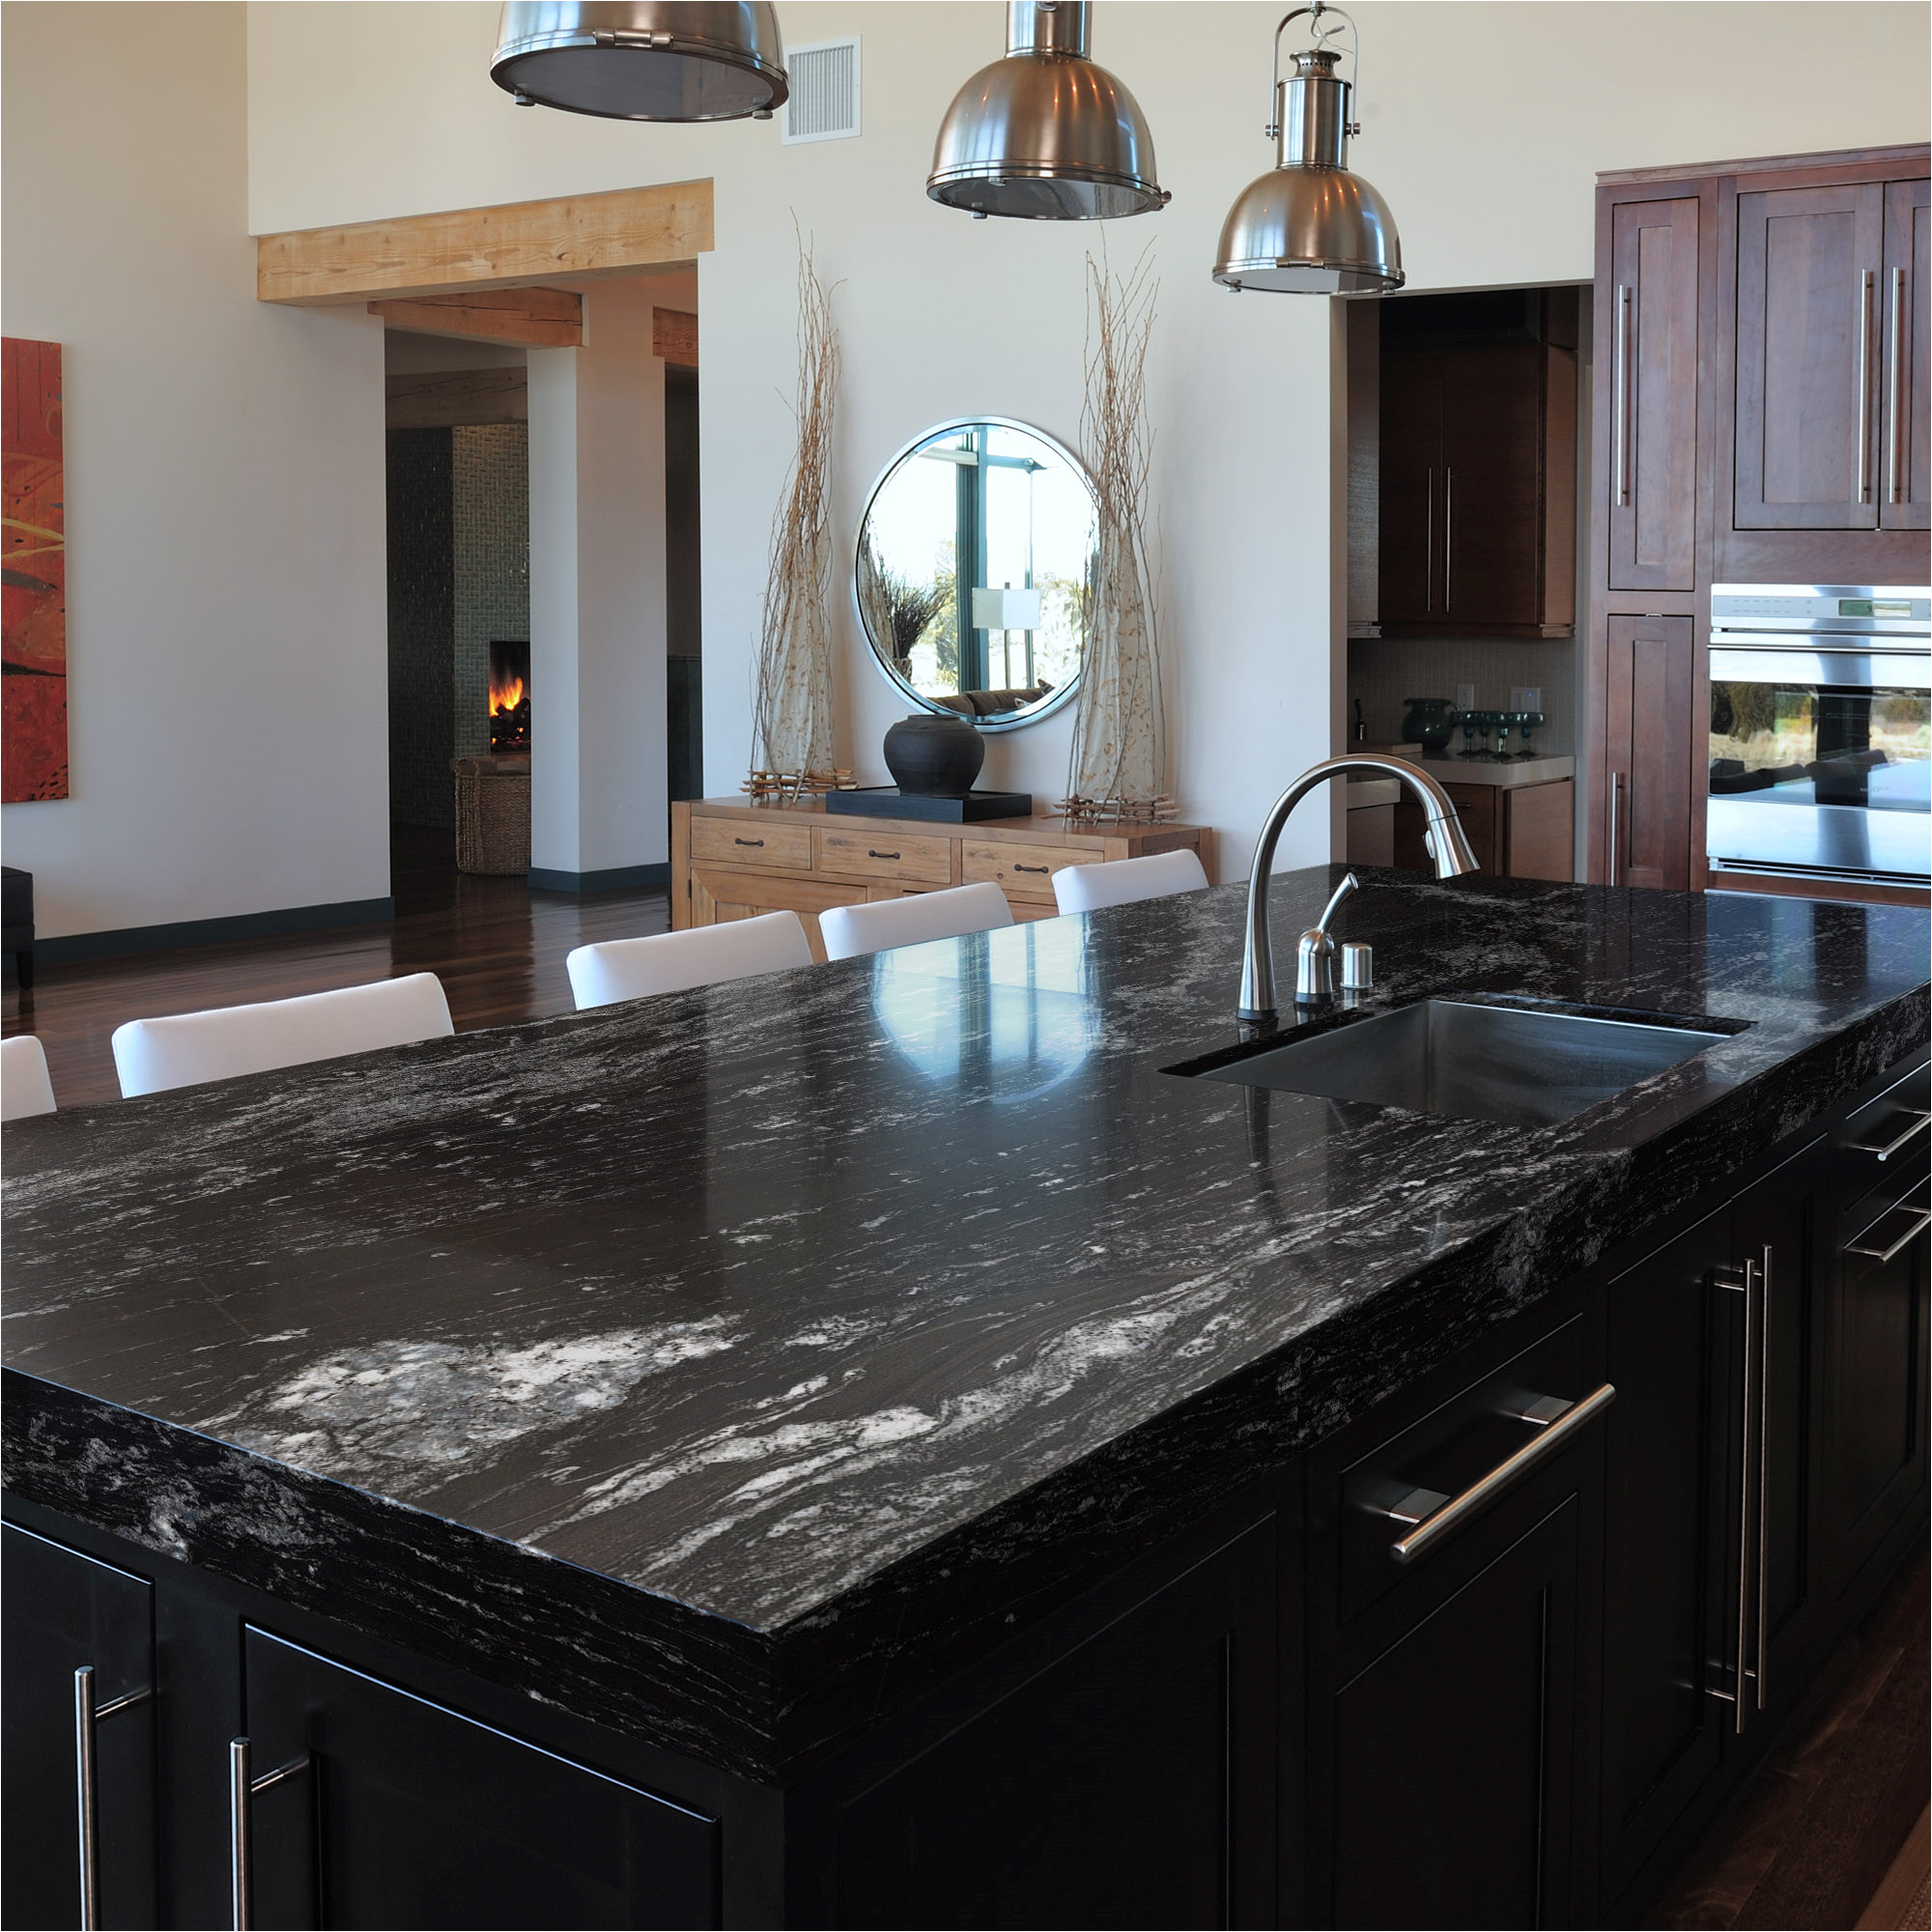 Alaska White Granite with Gray Cabinets Black Beauty Granite Sensa by Cosentino Kitchens Countertops